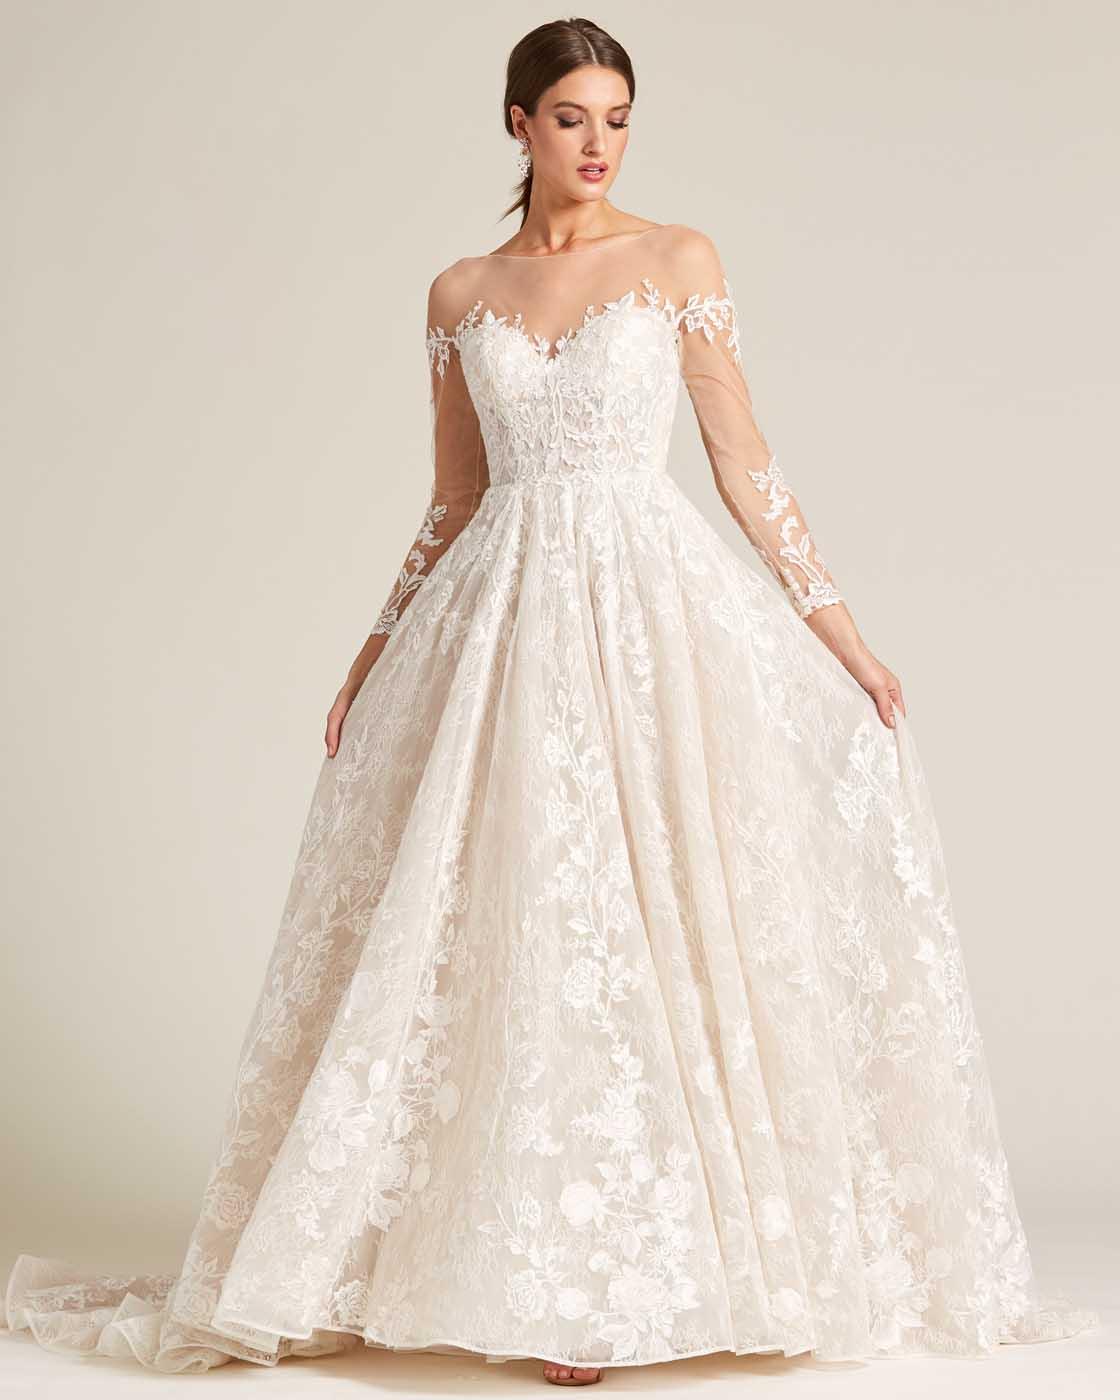 White Illusion Neckline Embroidered Sleeves Wedding Dress - Front